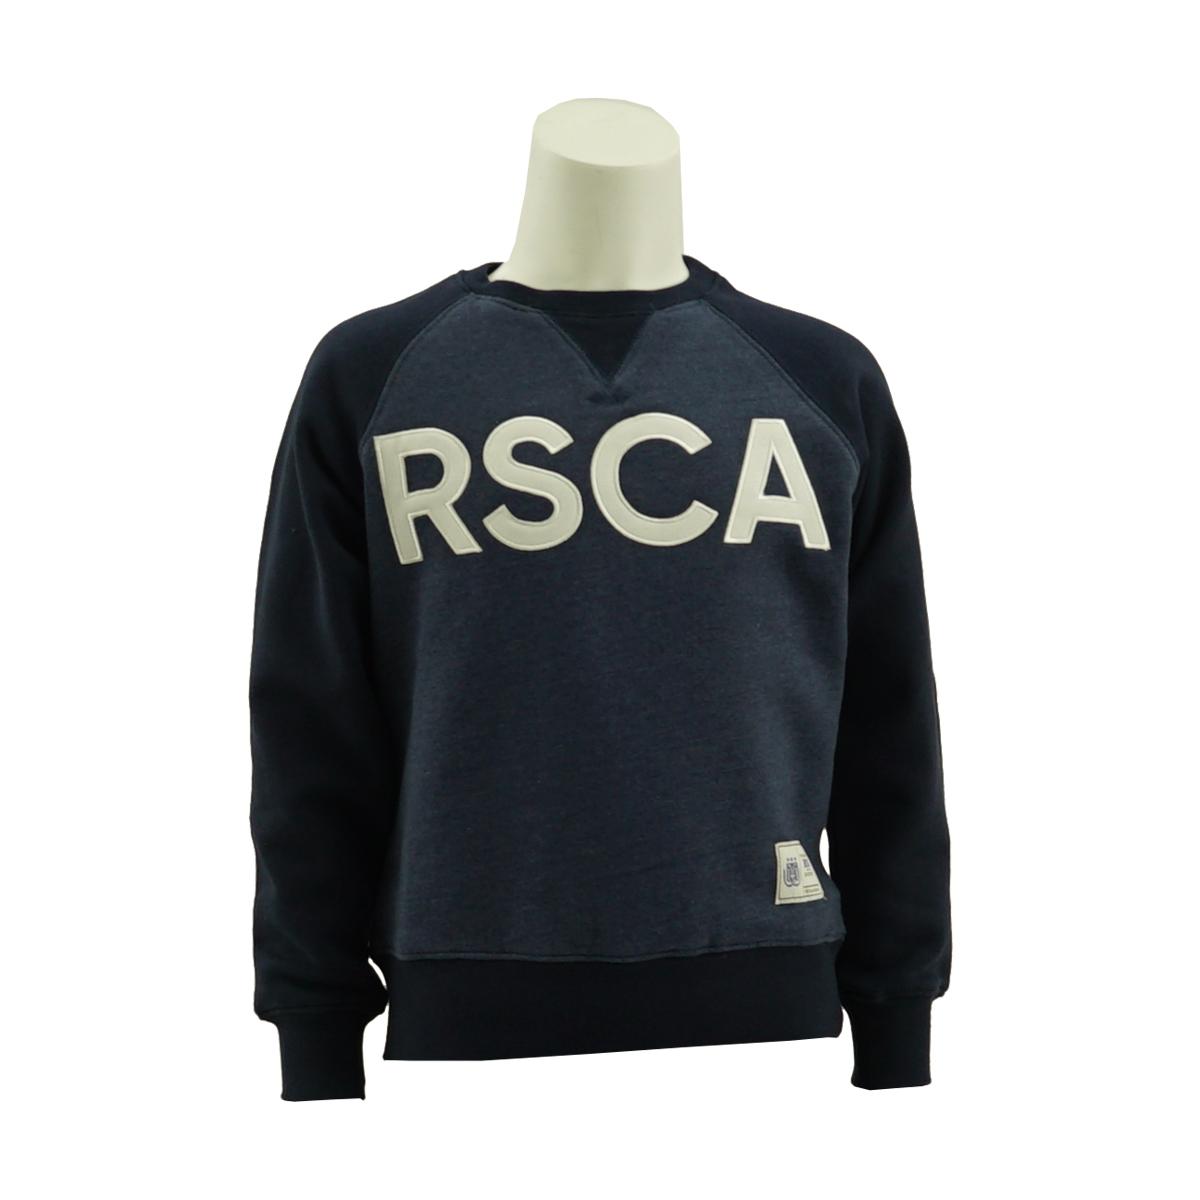 RSCA Sweater Kids Crewneck Raglan - Blauw